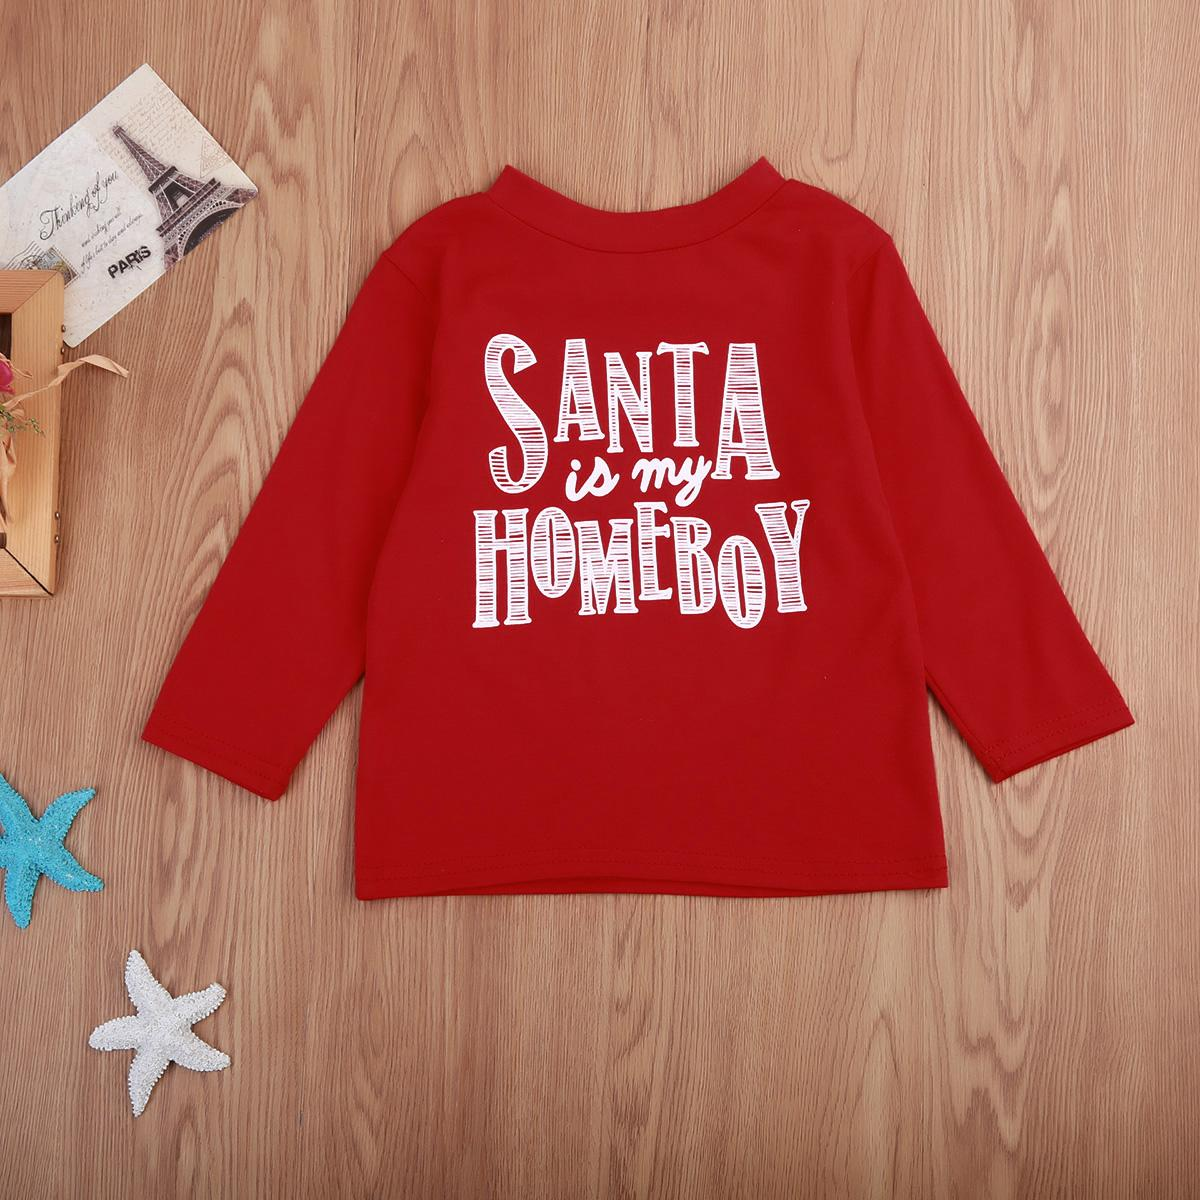 Navidad niño niños manga larga camiseta de navidad tee camiseta del niño Tops ropa 1-6Y